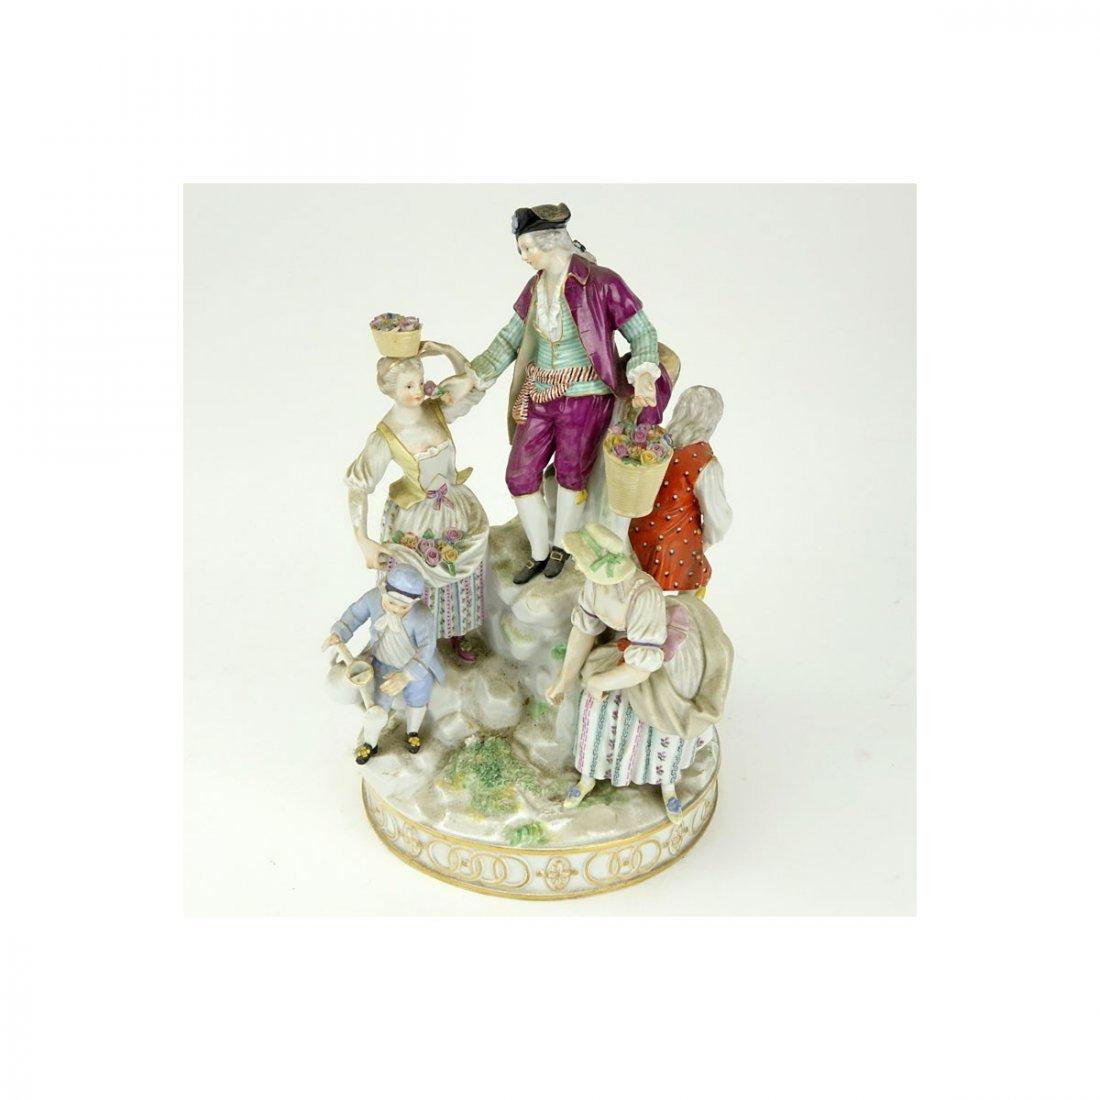 19th Century Meissen Hand Painted Porcelain Figural - 4